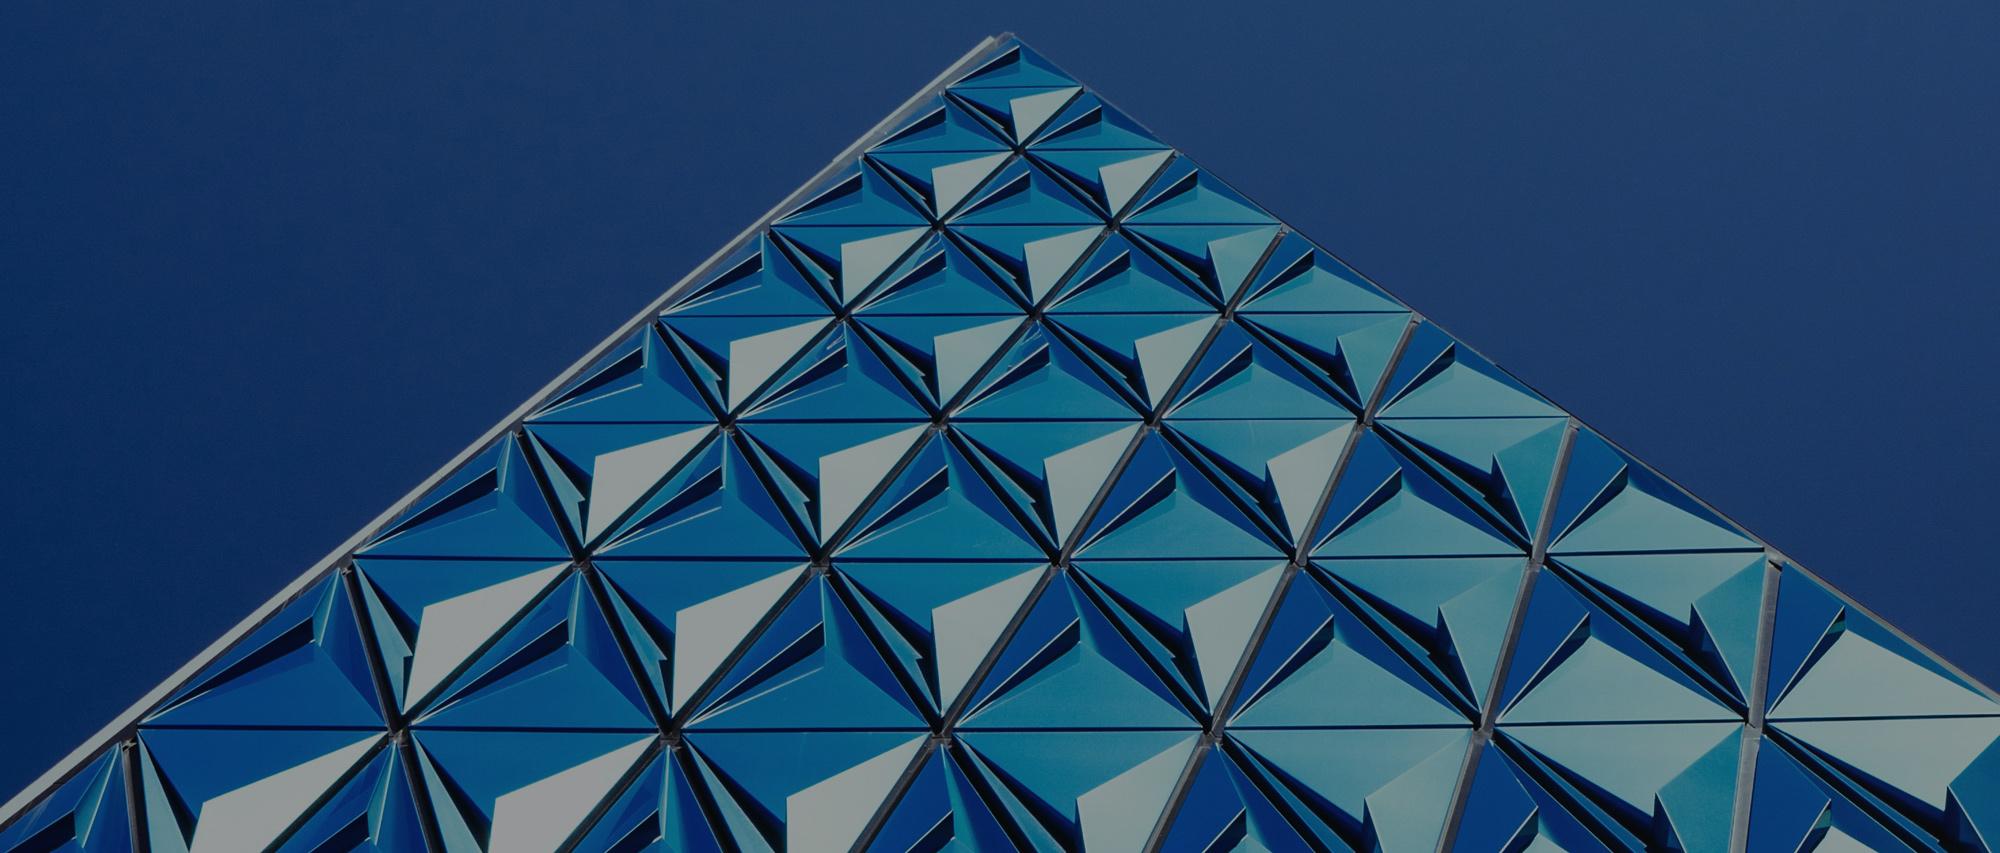 banner-pyramid-blue-sky-2